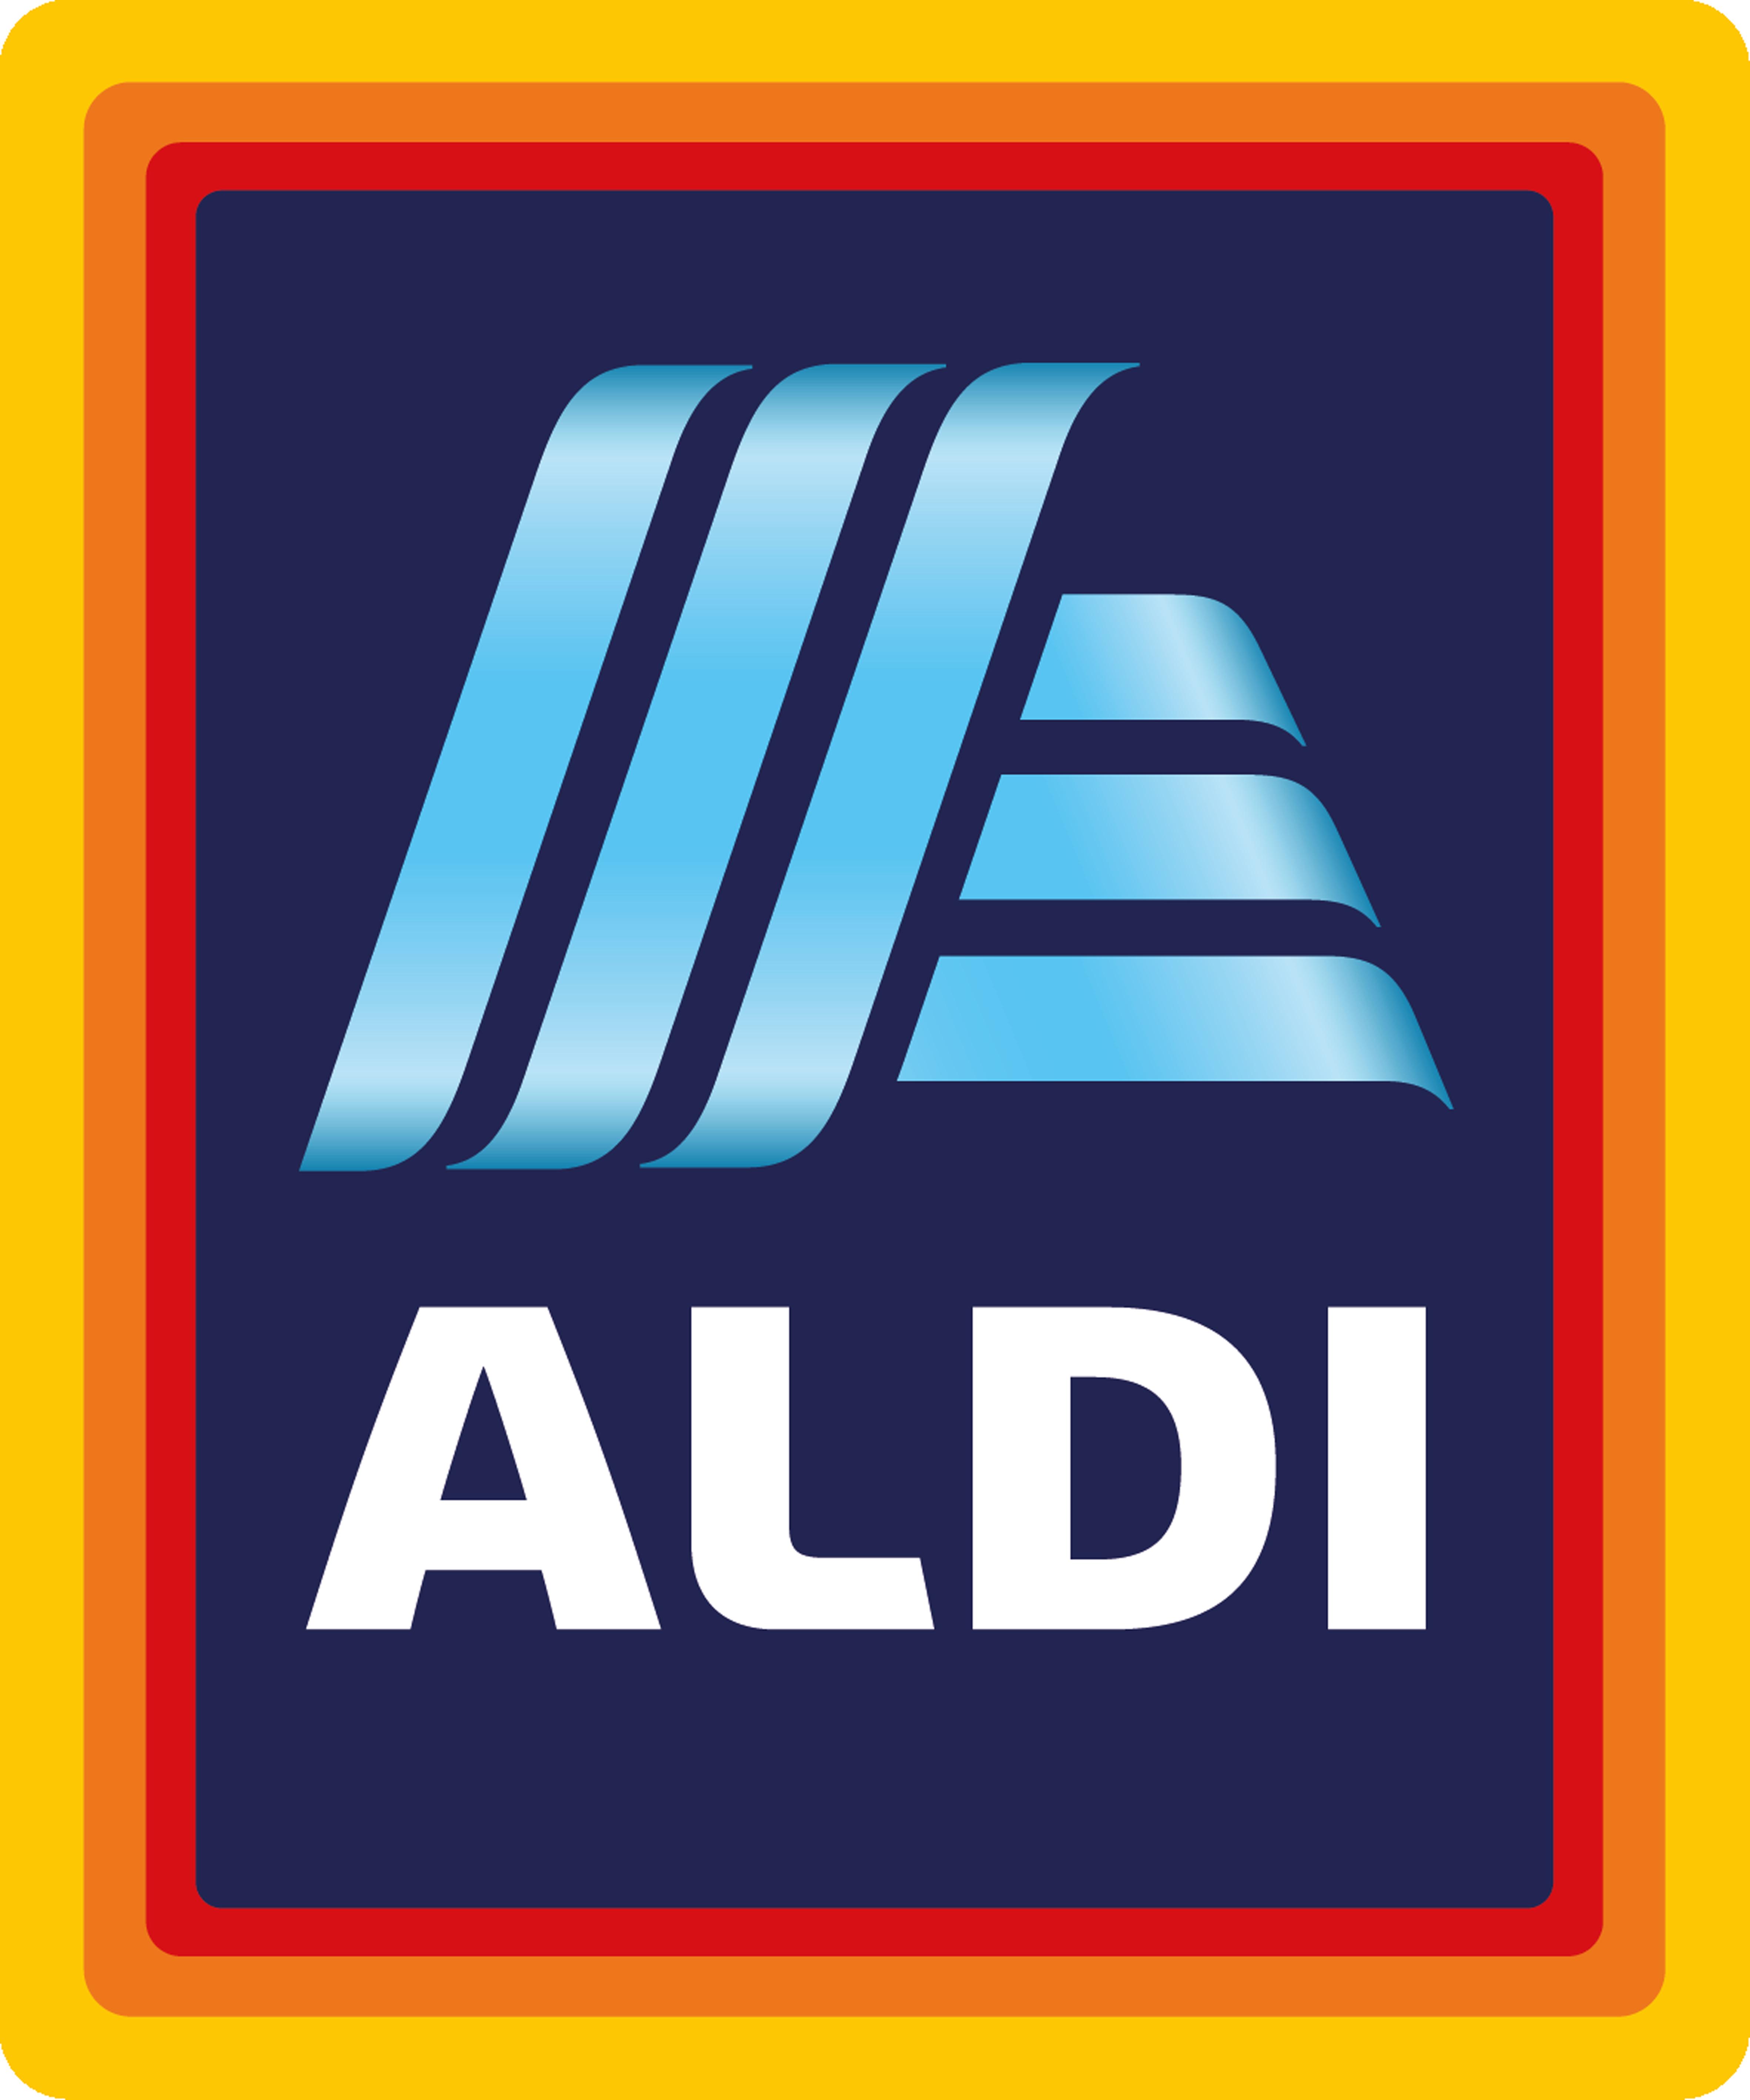 Aldi logotype